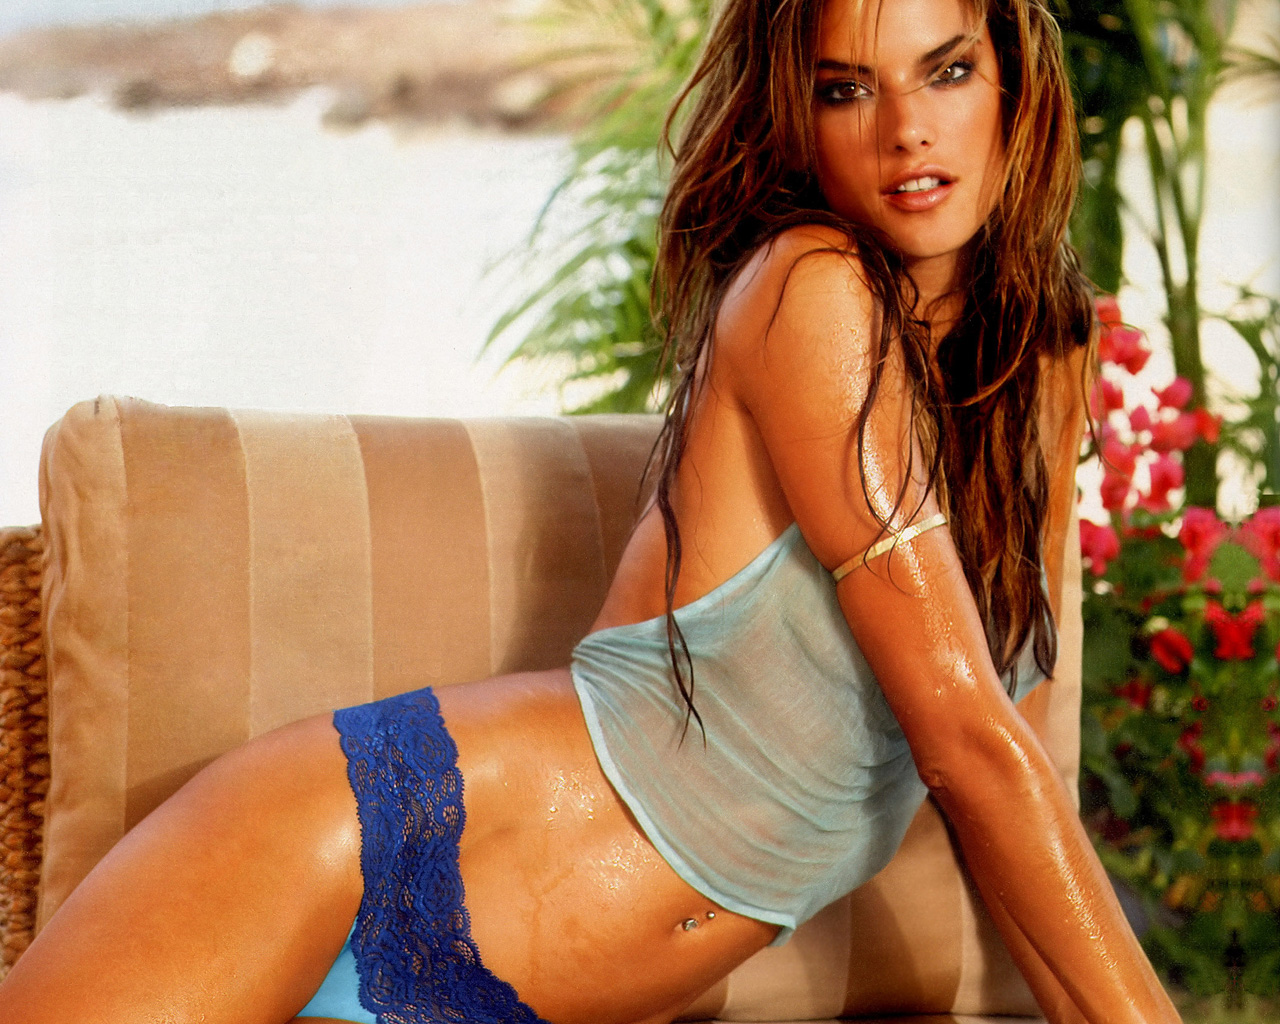 http://1.bp.blogspot.com/-lgNhzxvUjkU/TelNVJCpD7I/AAAAAAAAAWQ/irnlYeCHWlQ/s1600/Alessandra+Ambrosio.jpg